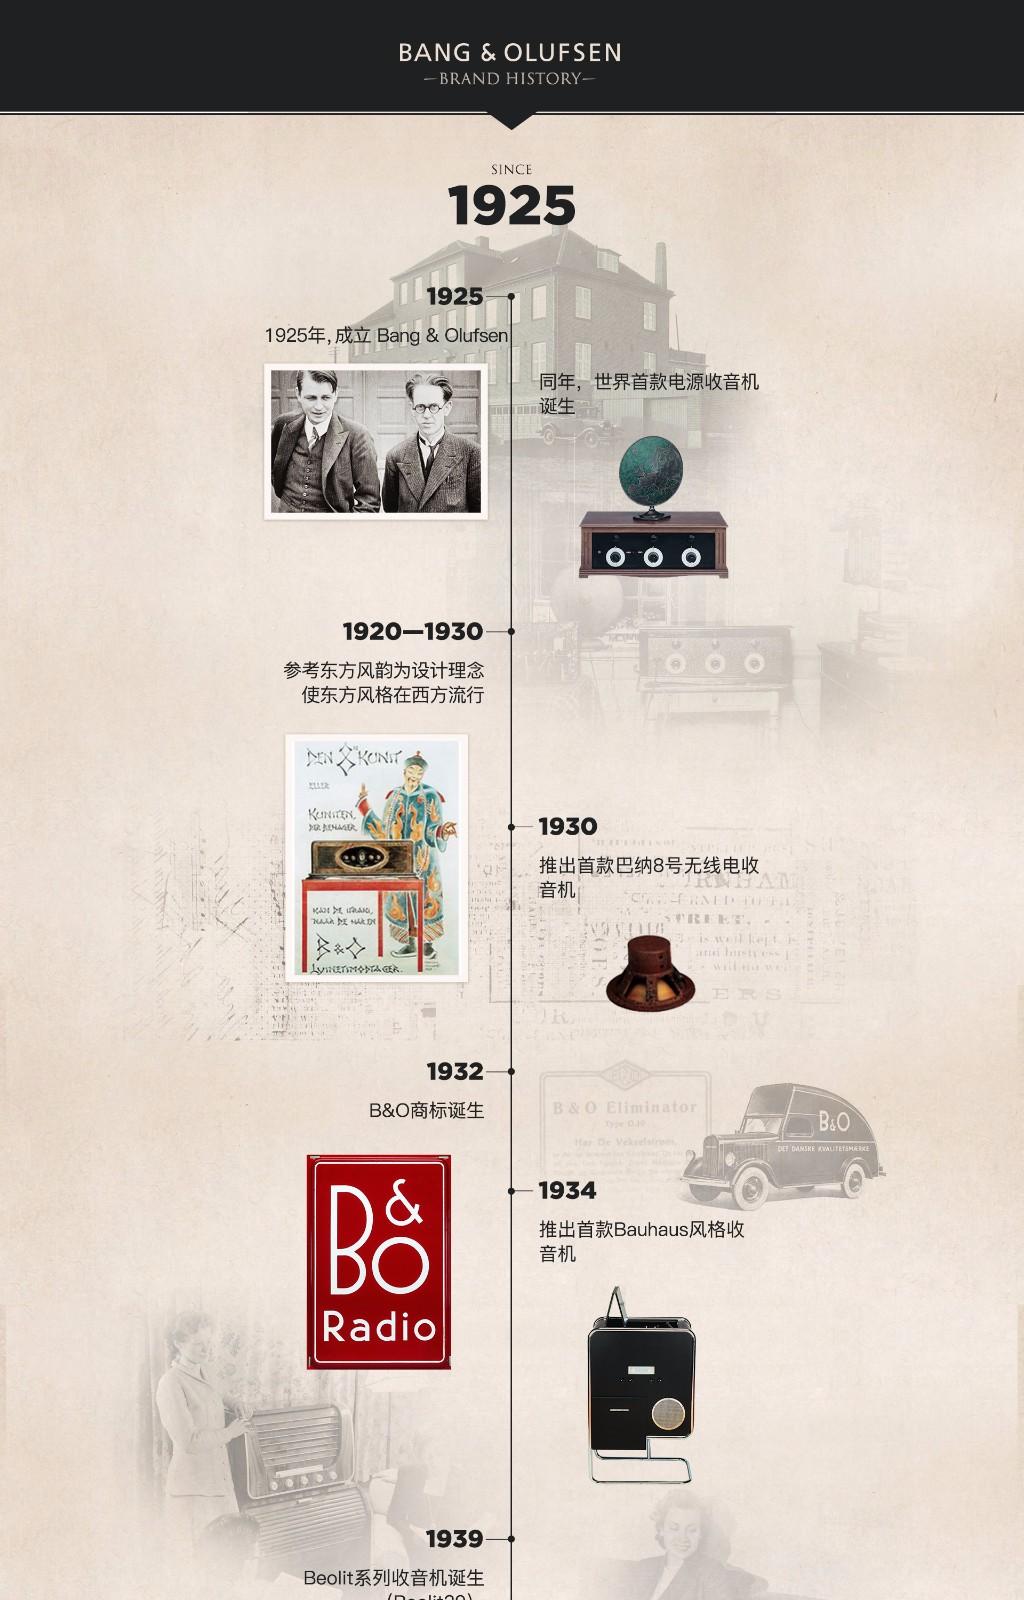 History of B&O~|B&O-百利商业有限公司